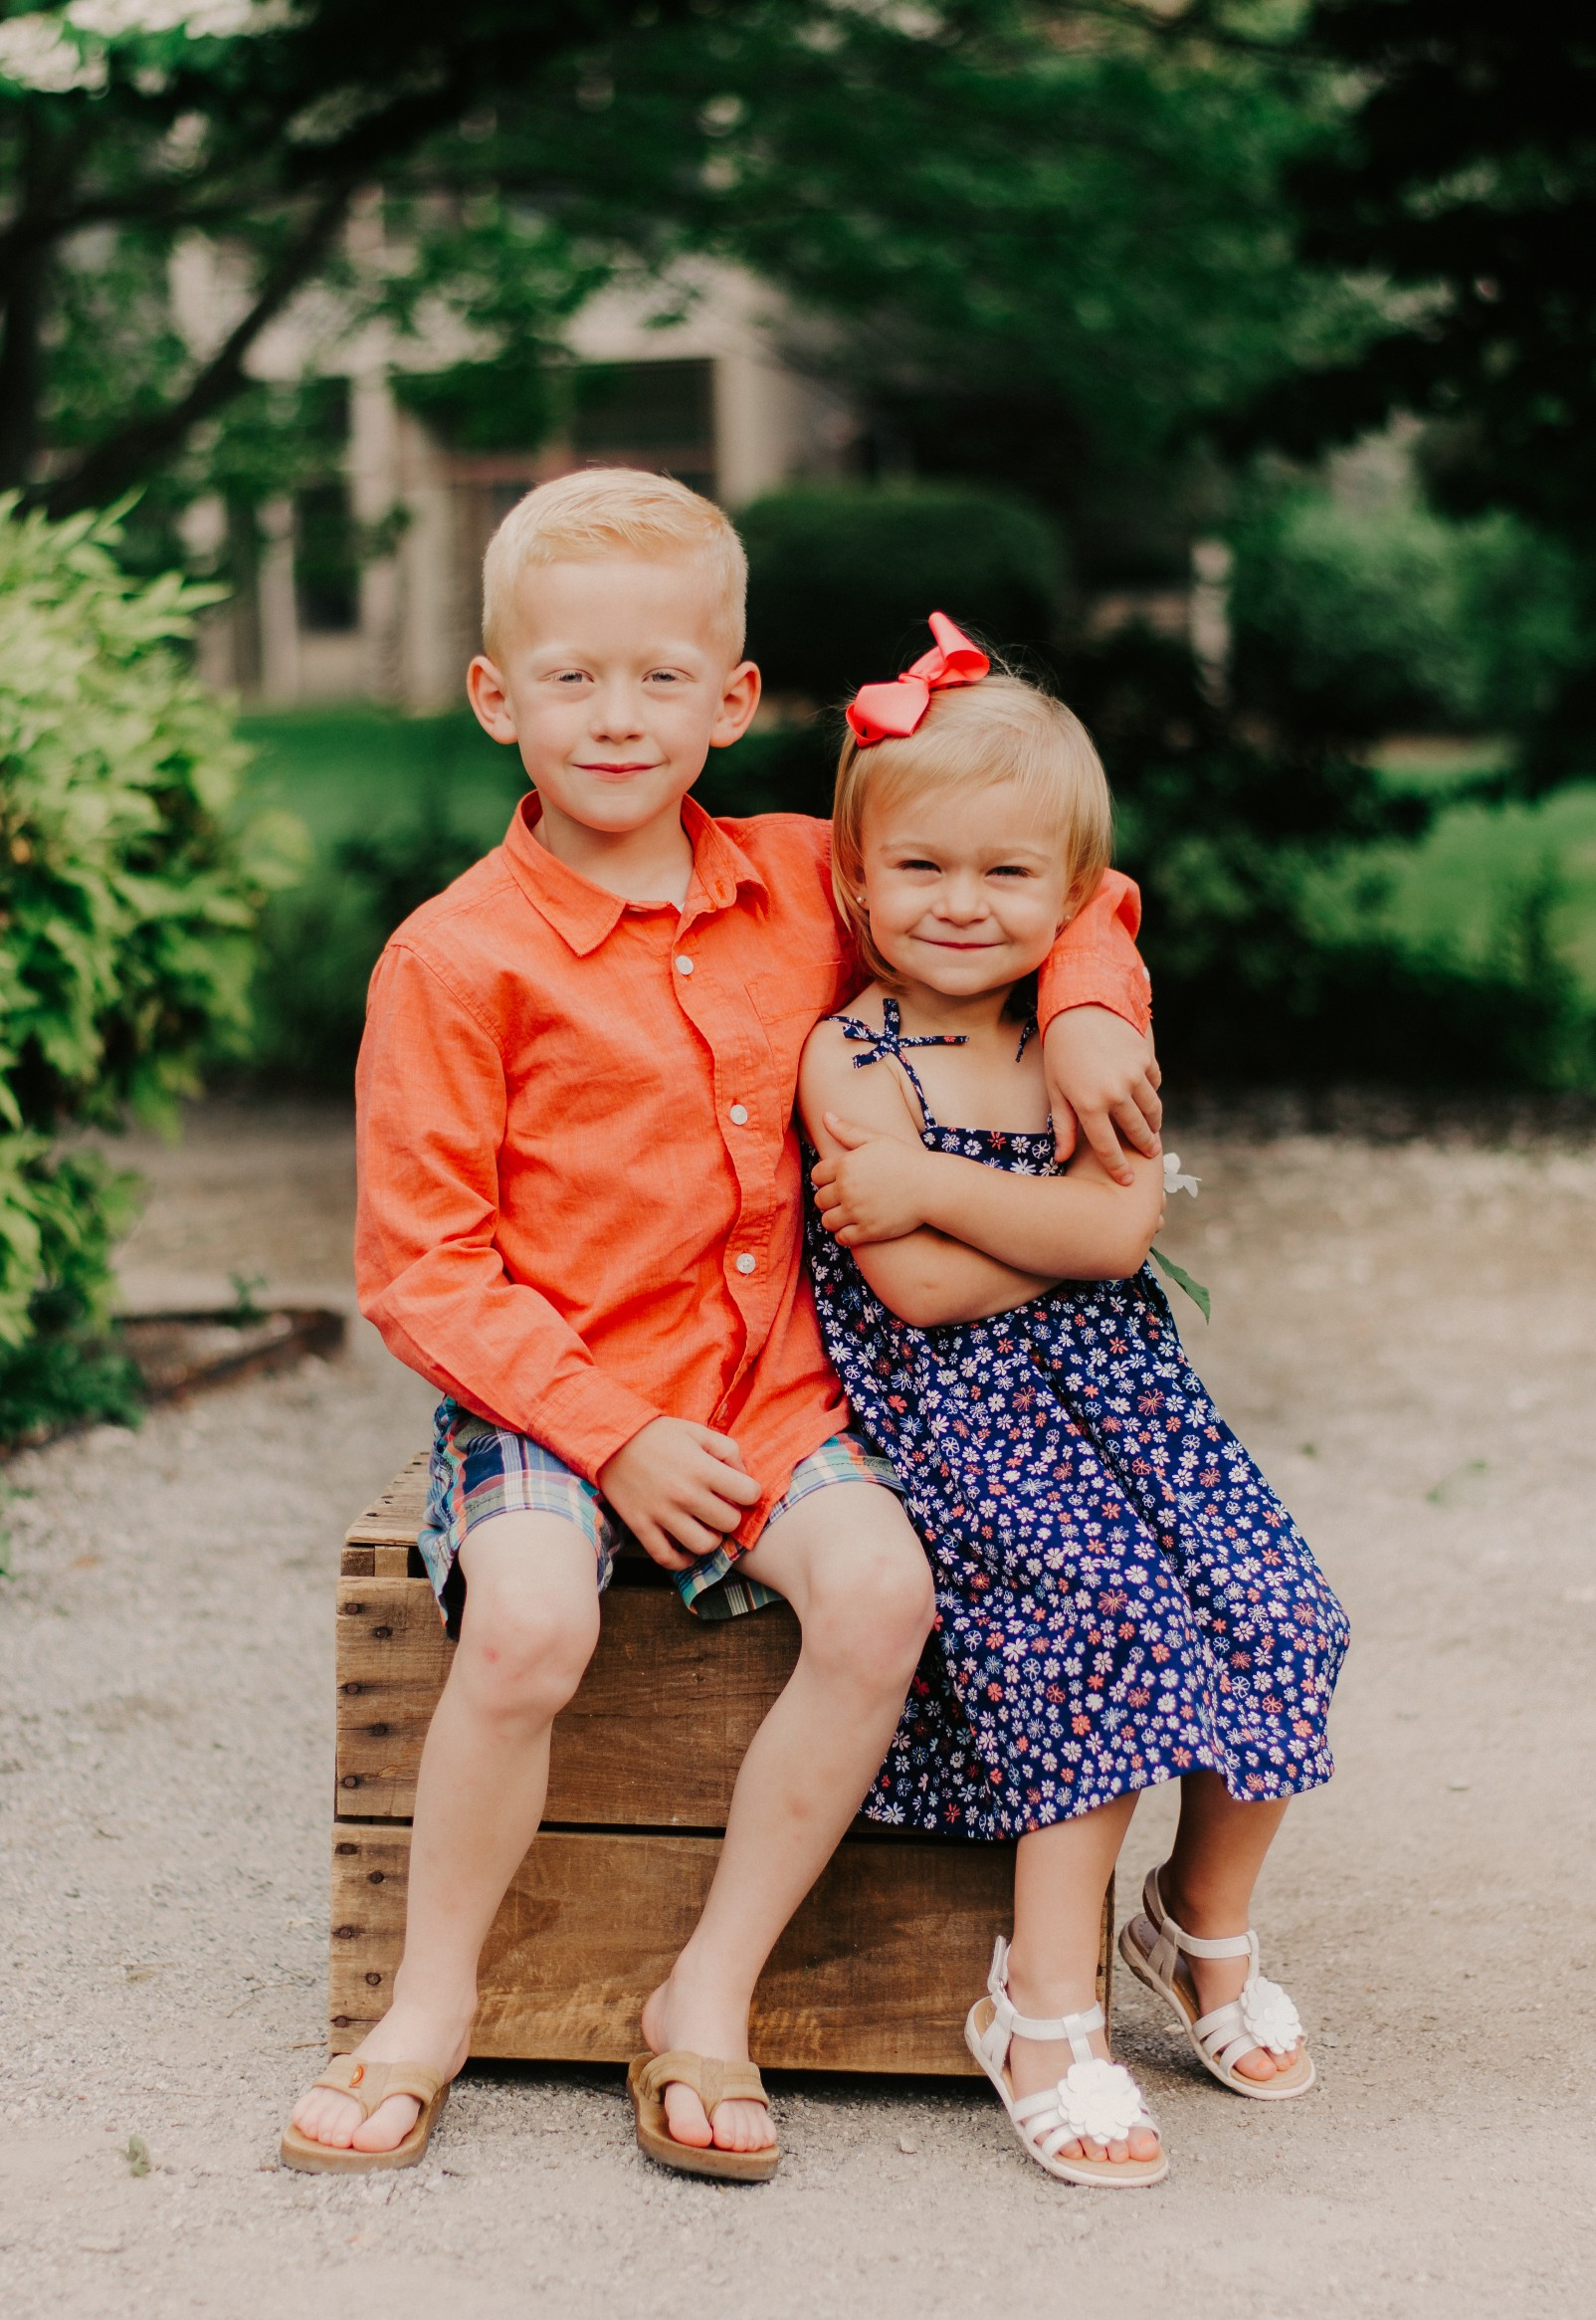 sibling-photography-children.jpg.